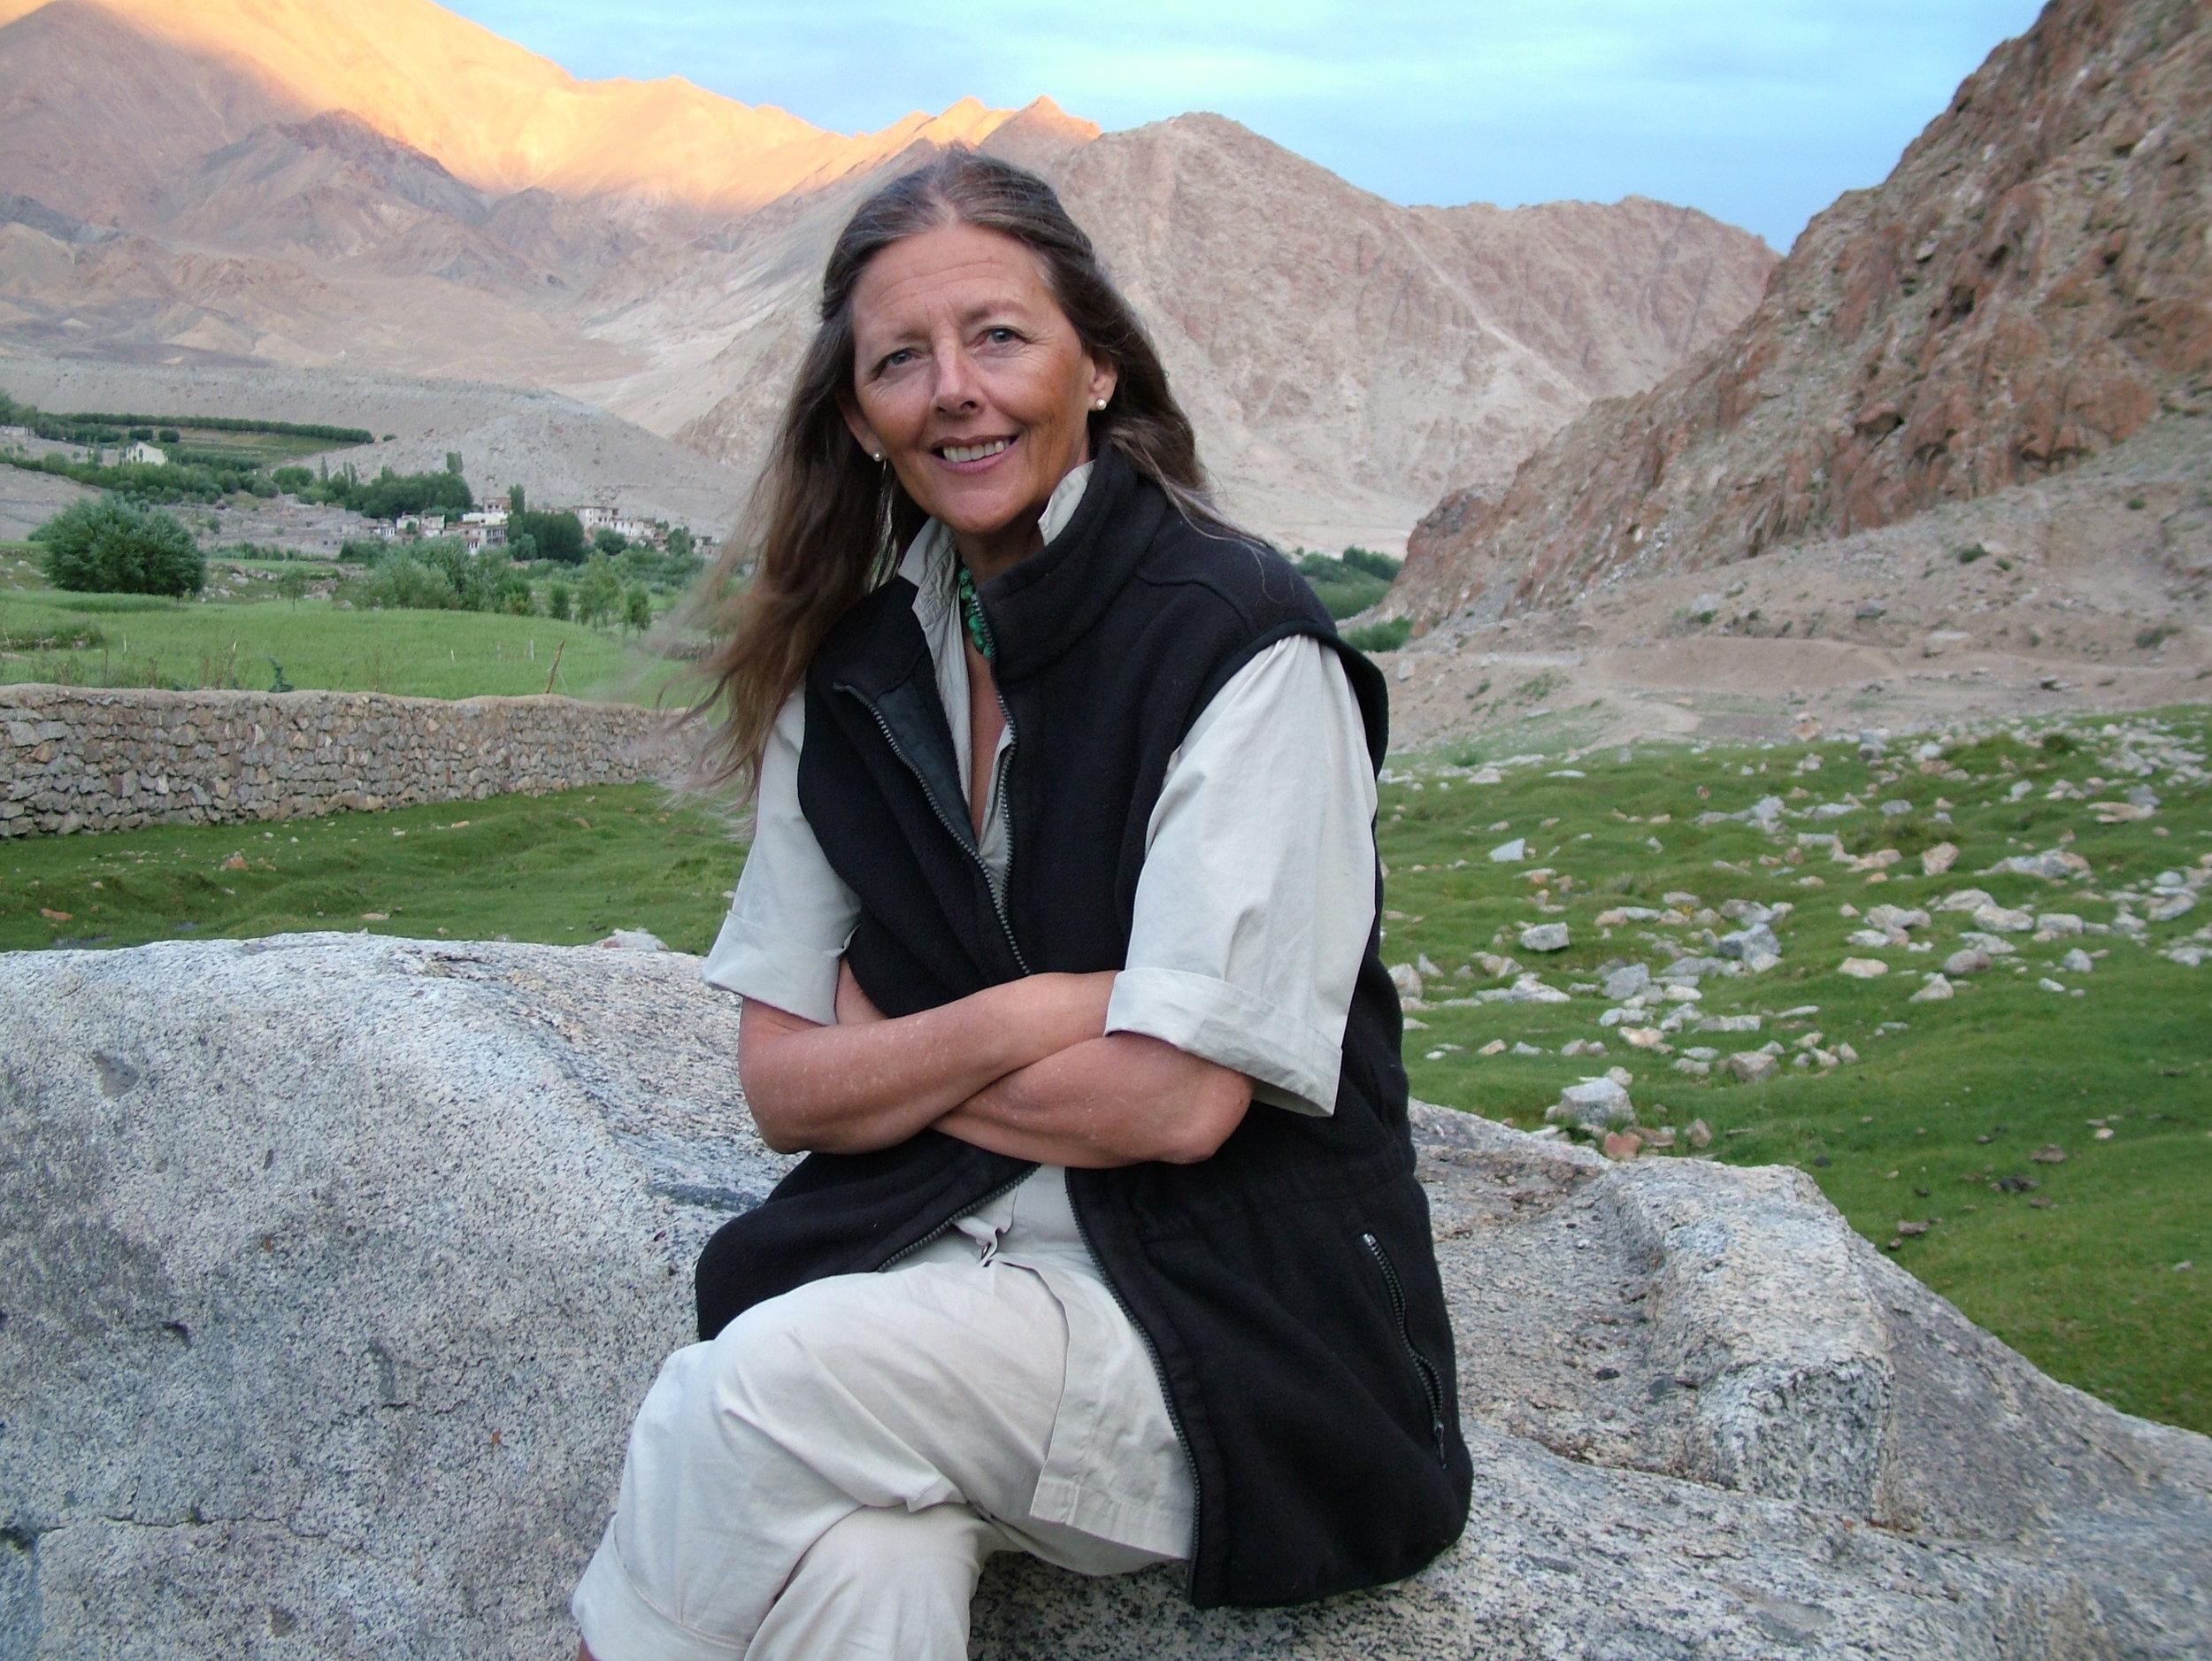 Helena Norberg-Hodge, Ladakh, India